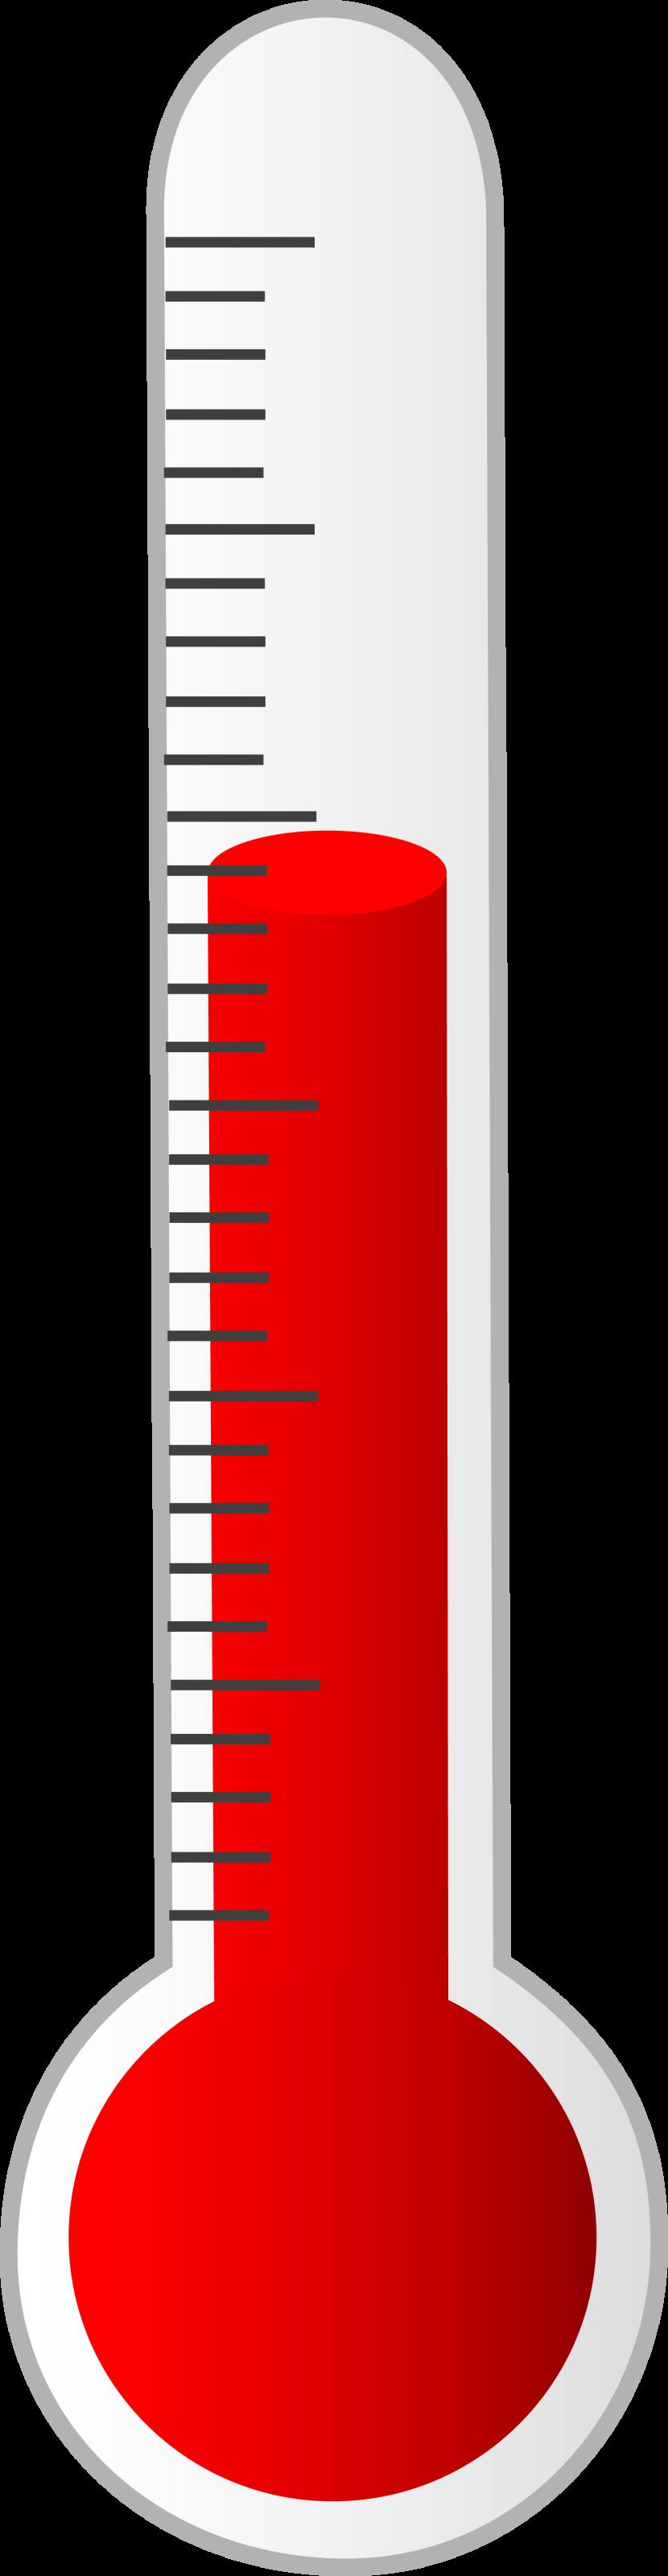 830x3200 True Clipart Goal